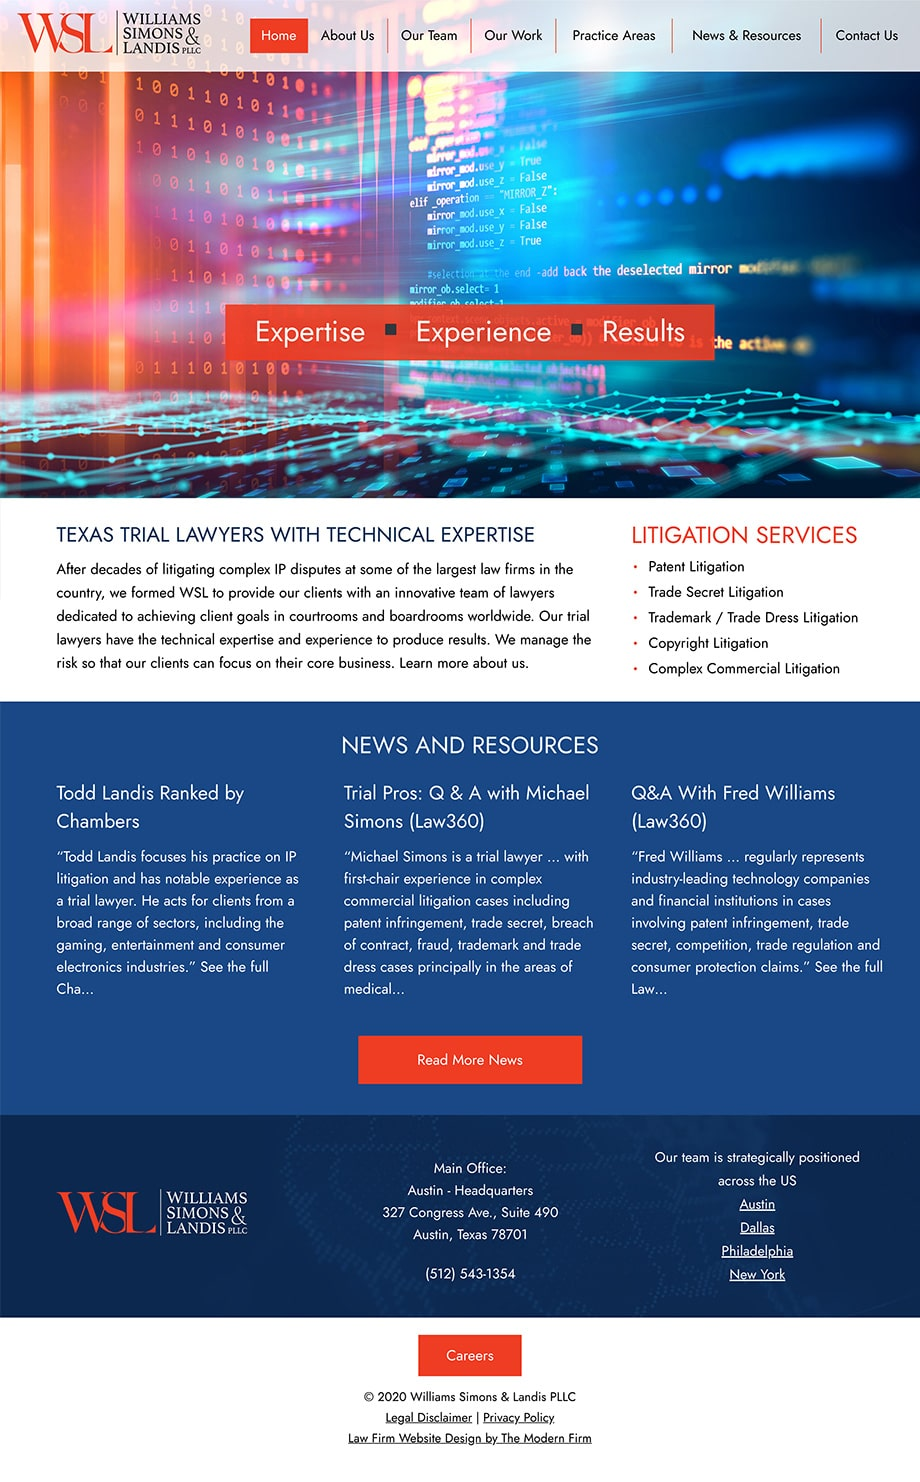 Law Firm Website Design for Williams Simons & Landis PLLC